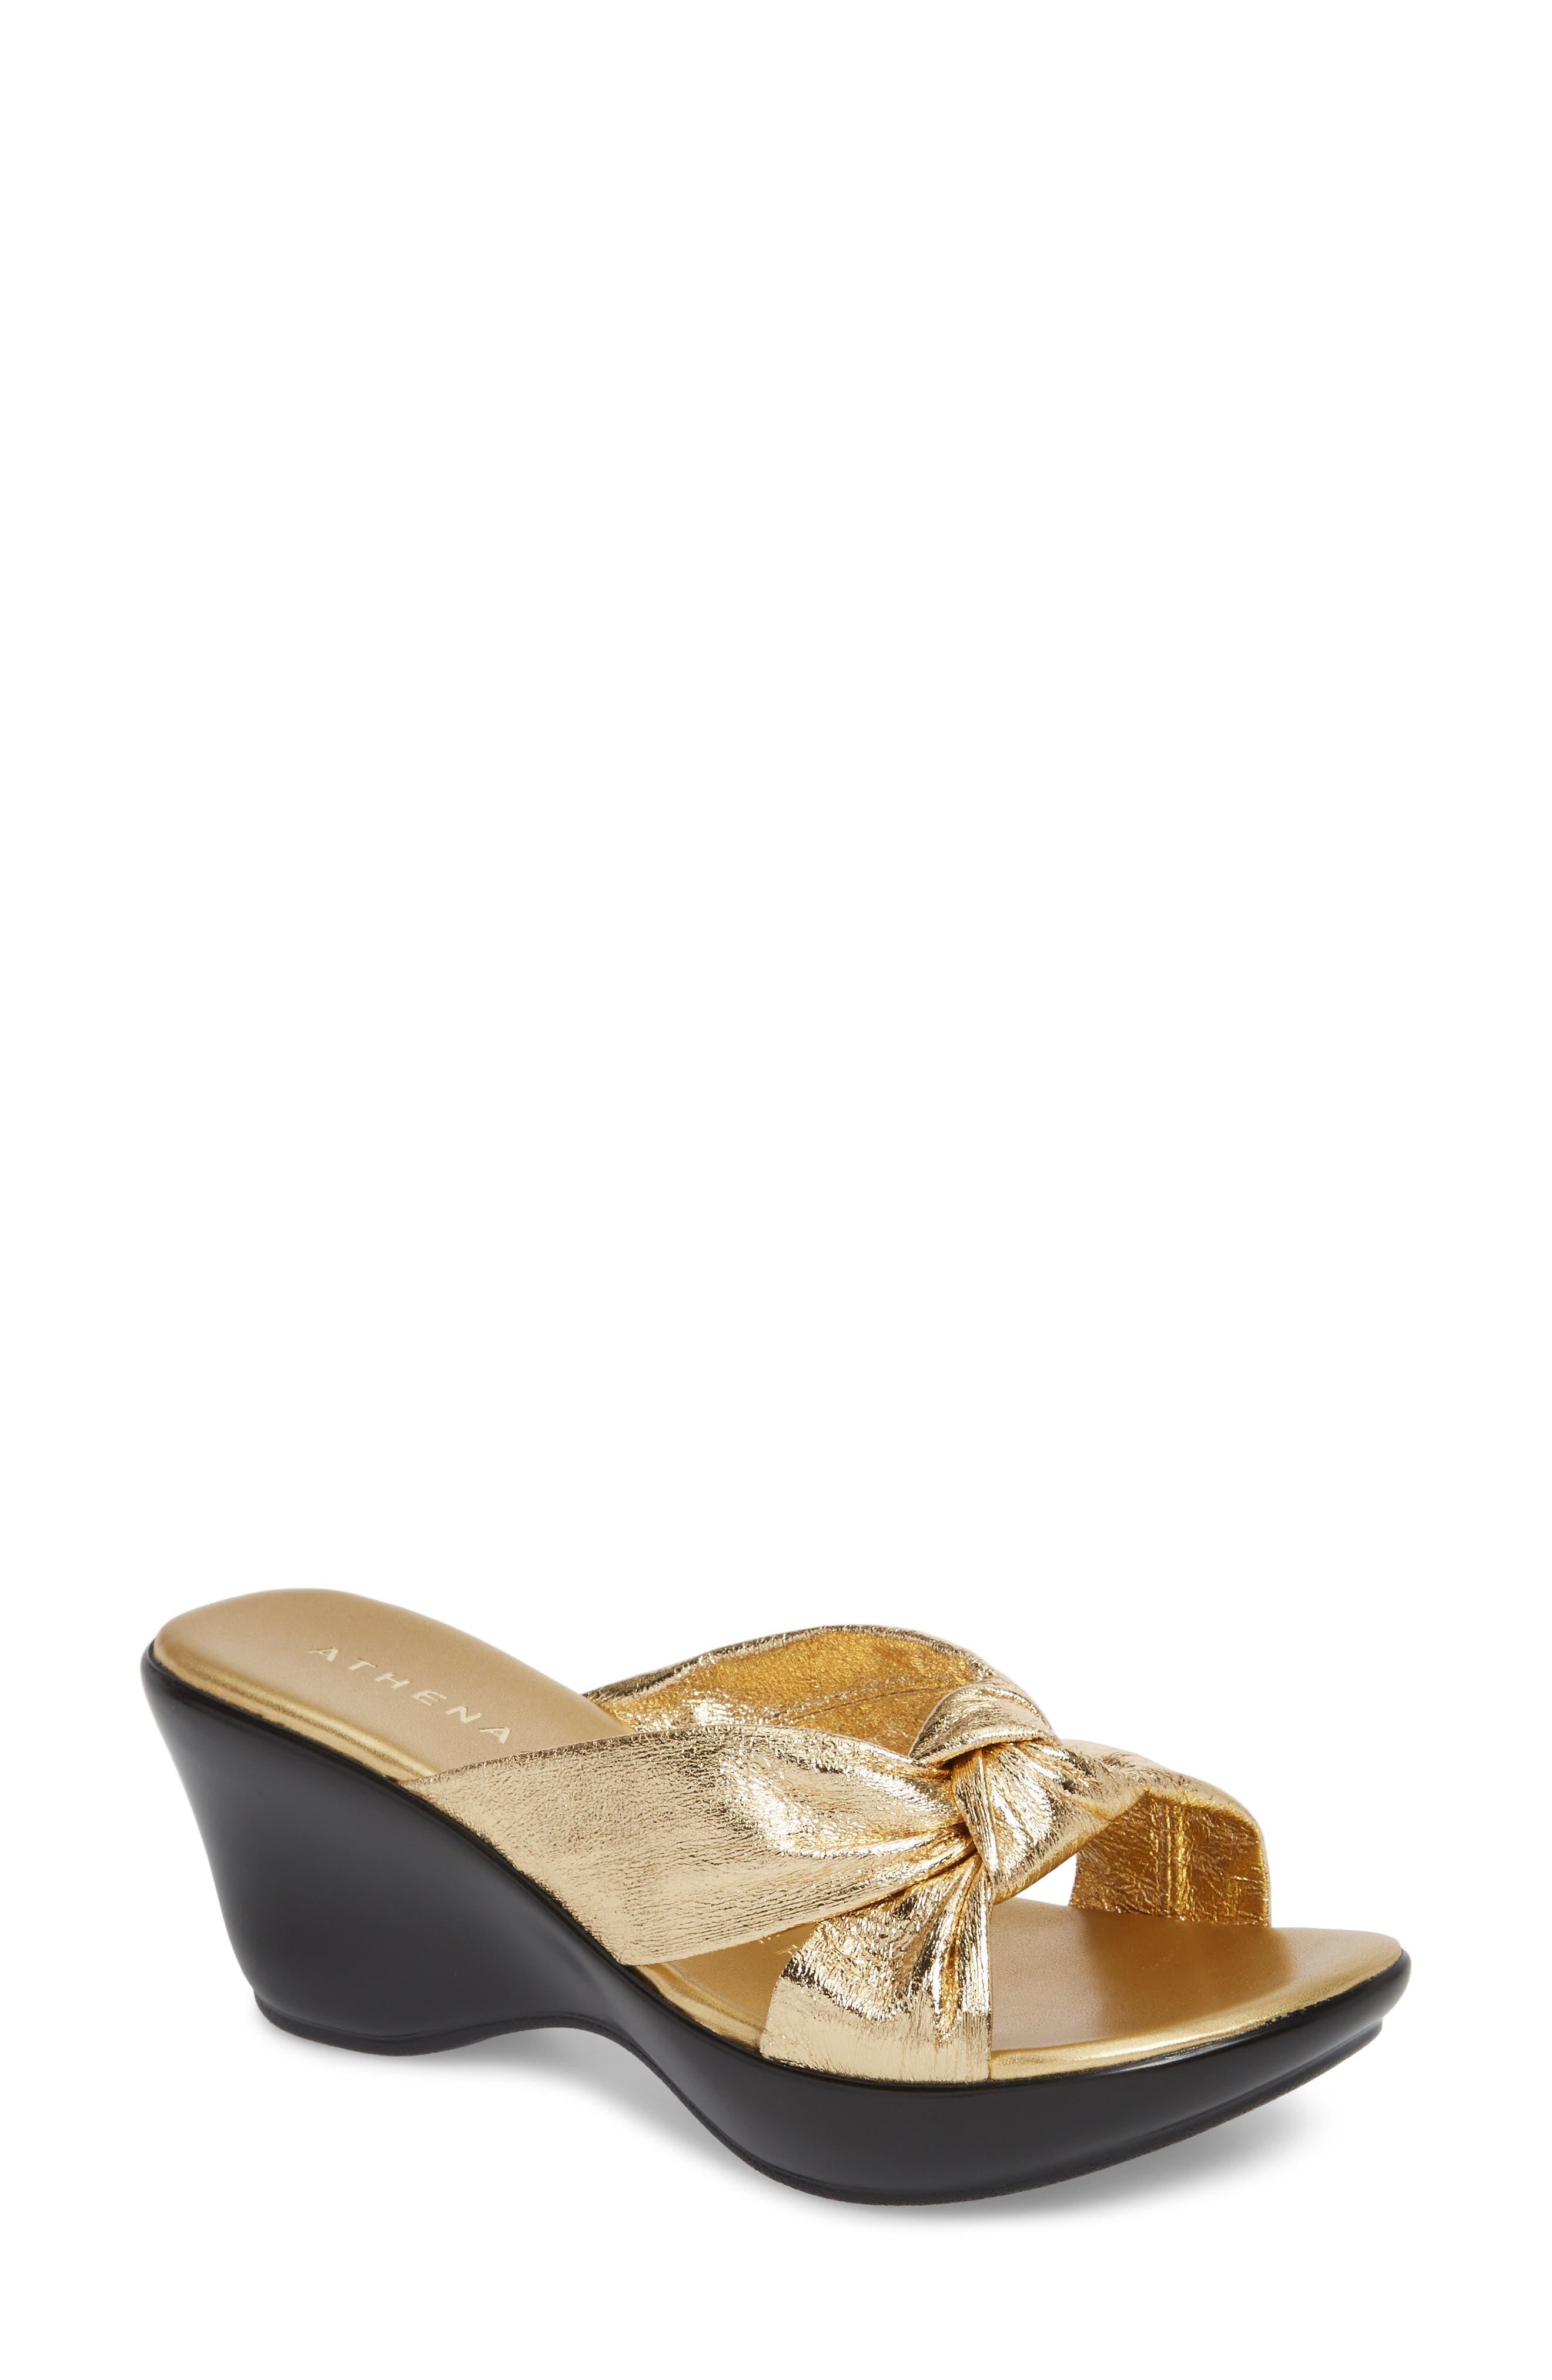 Athena Alexander Soraya Wedge Sandal- Metallic